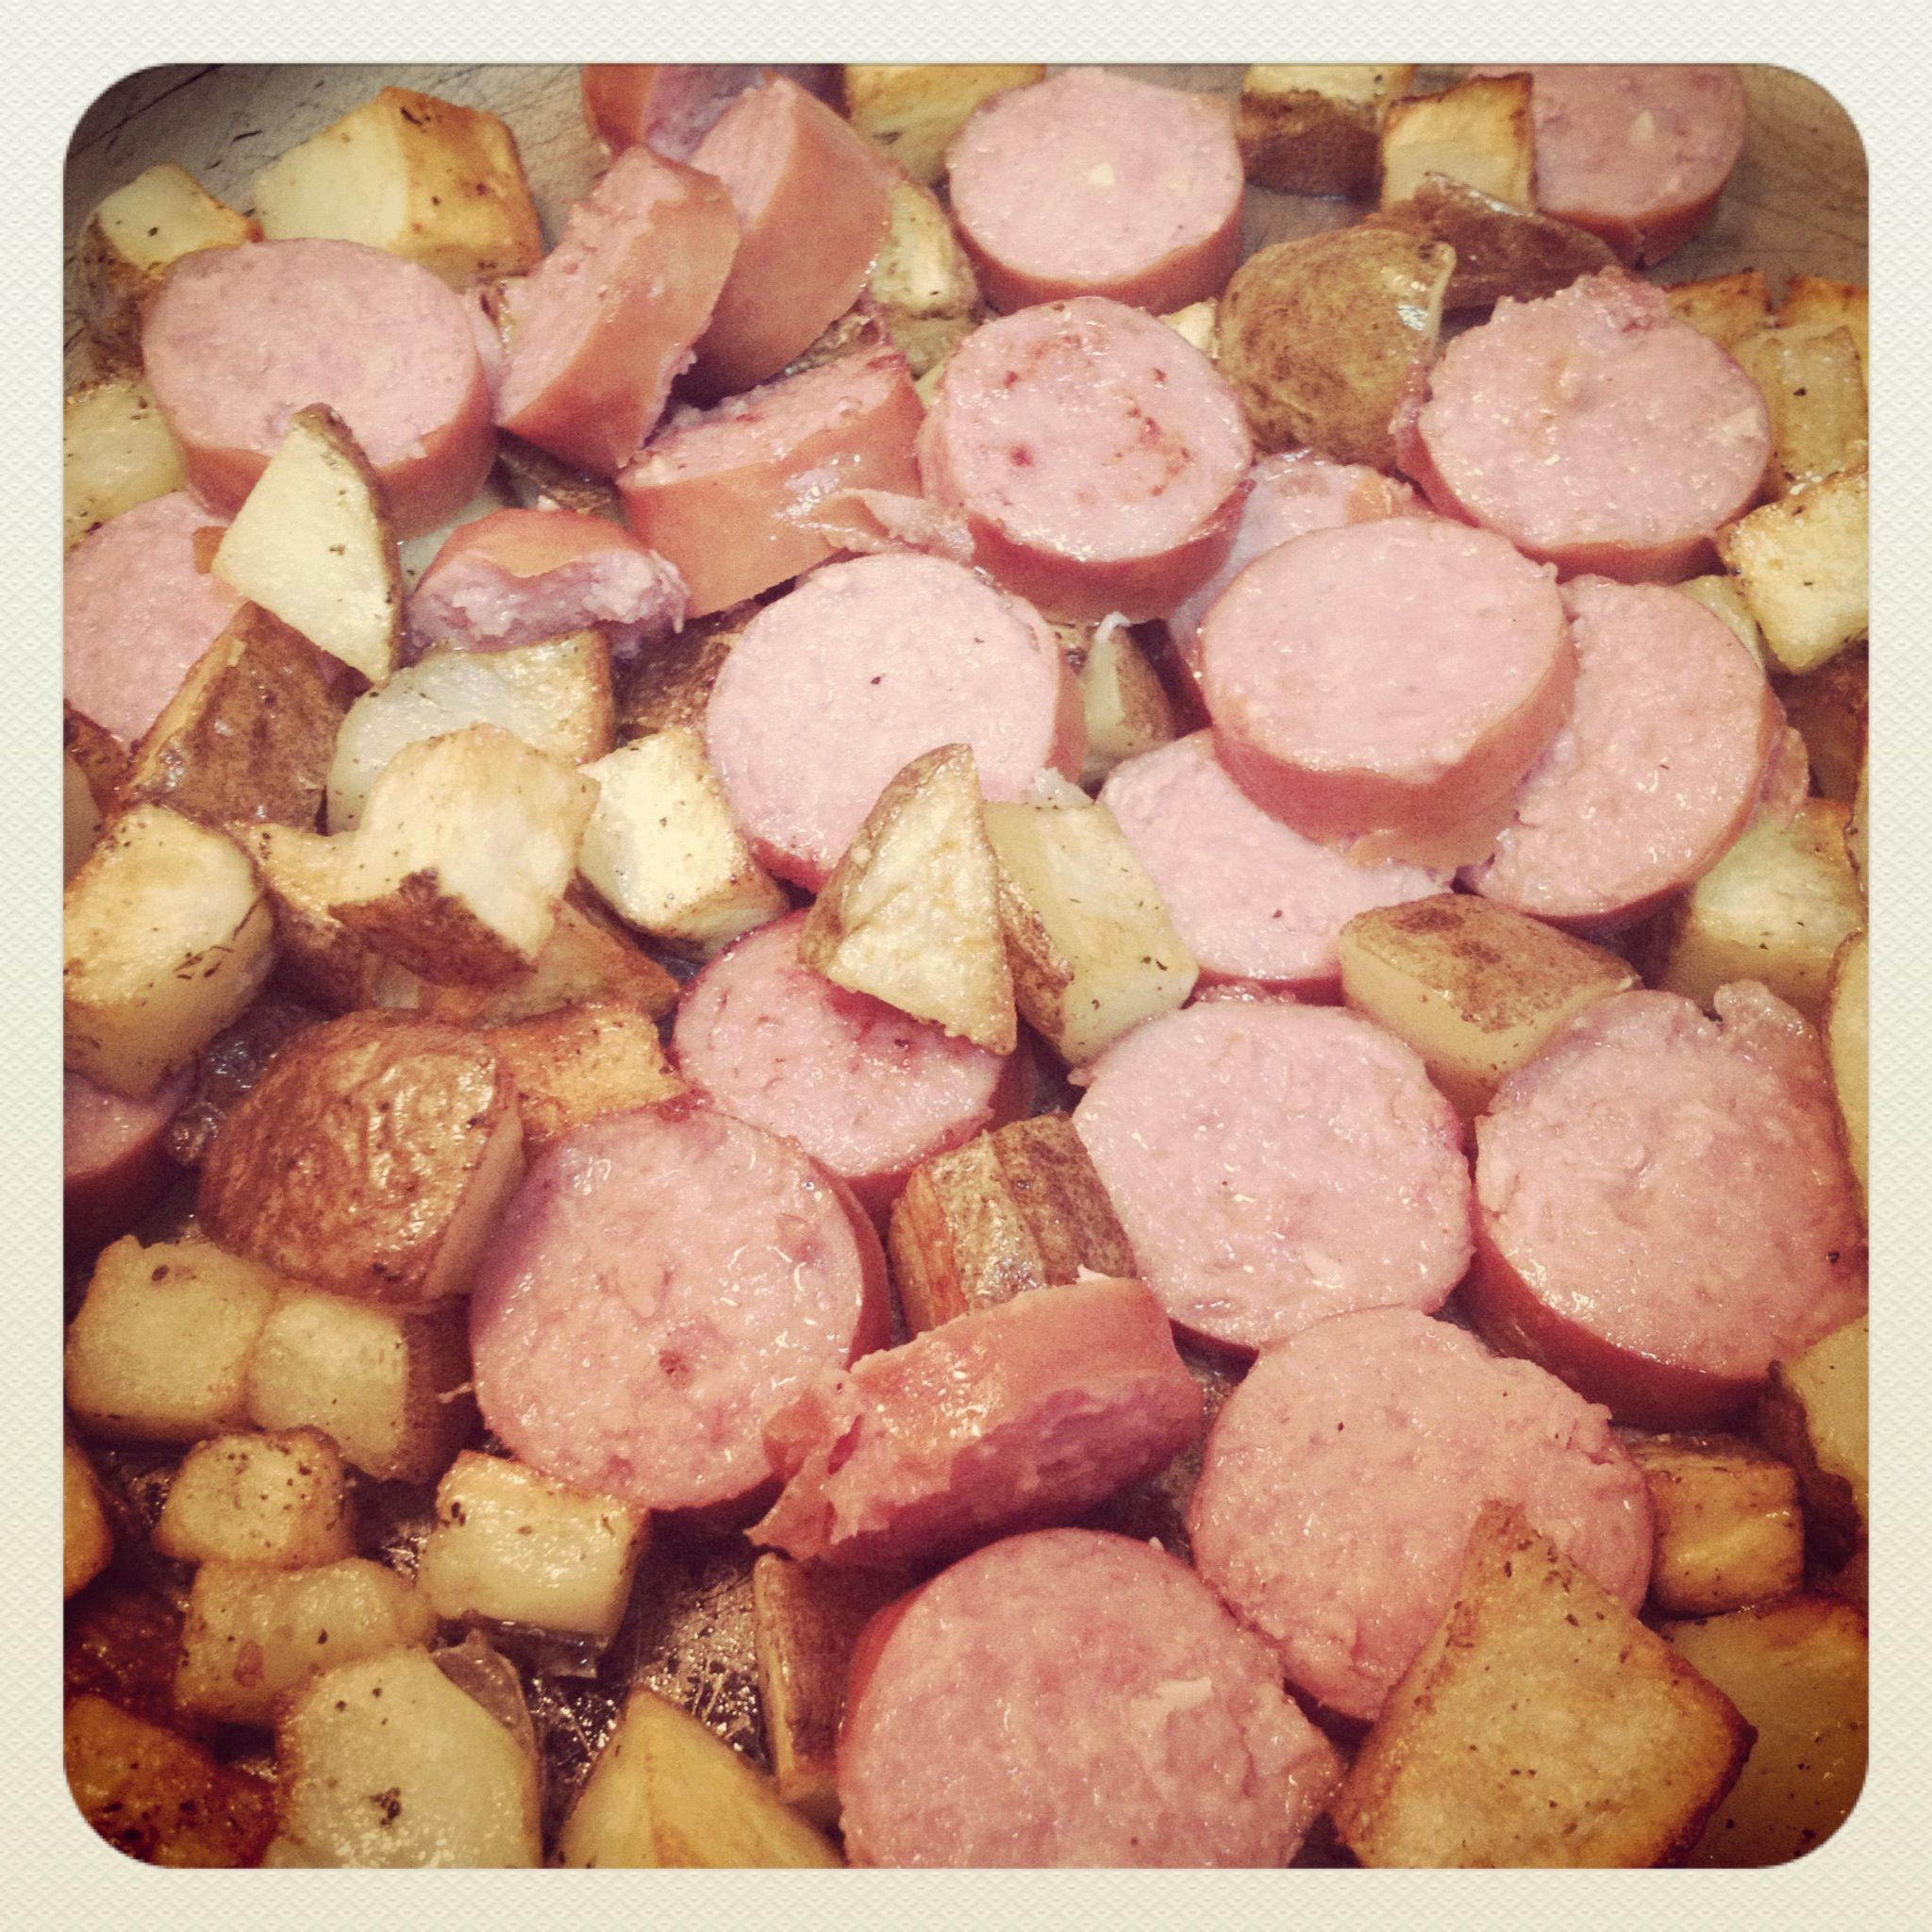 Smoked sausage and country potatoes